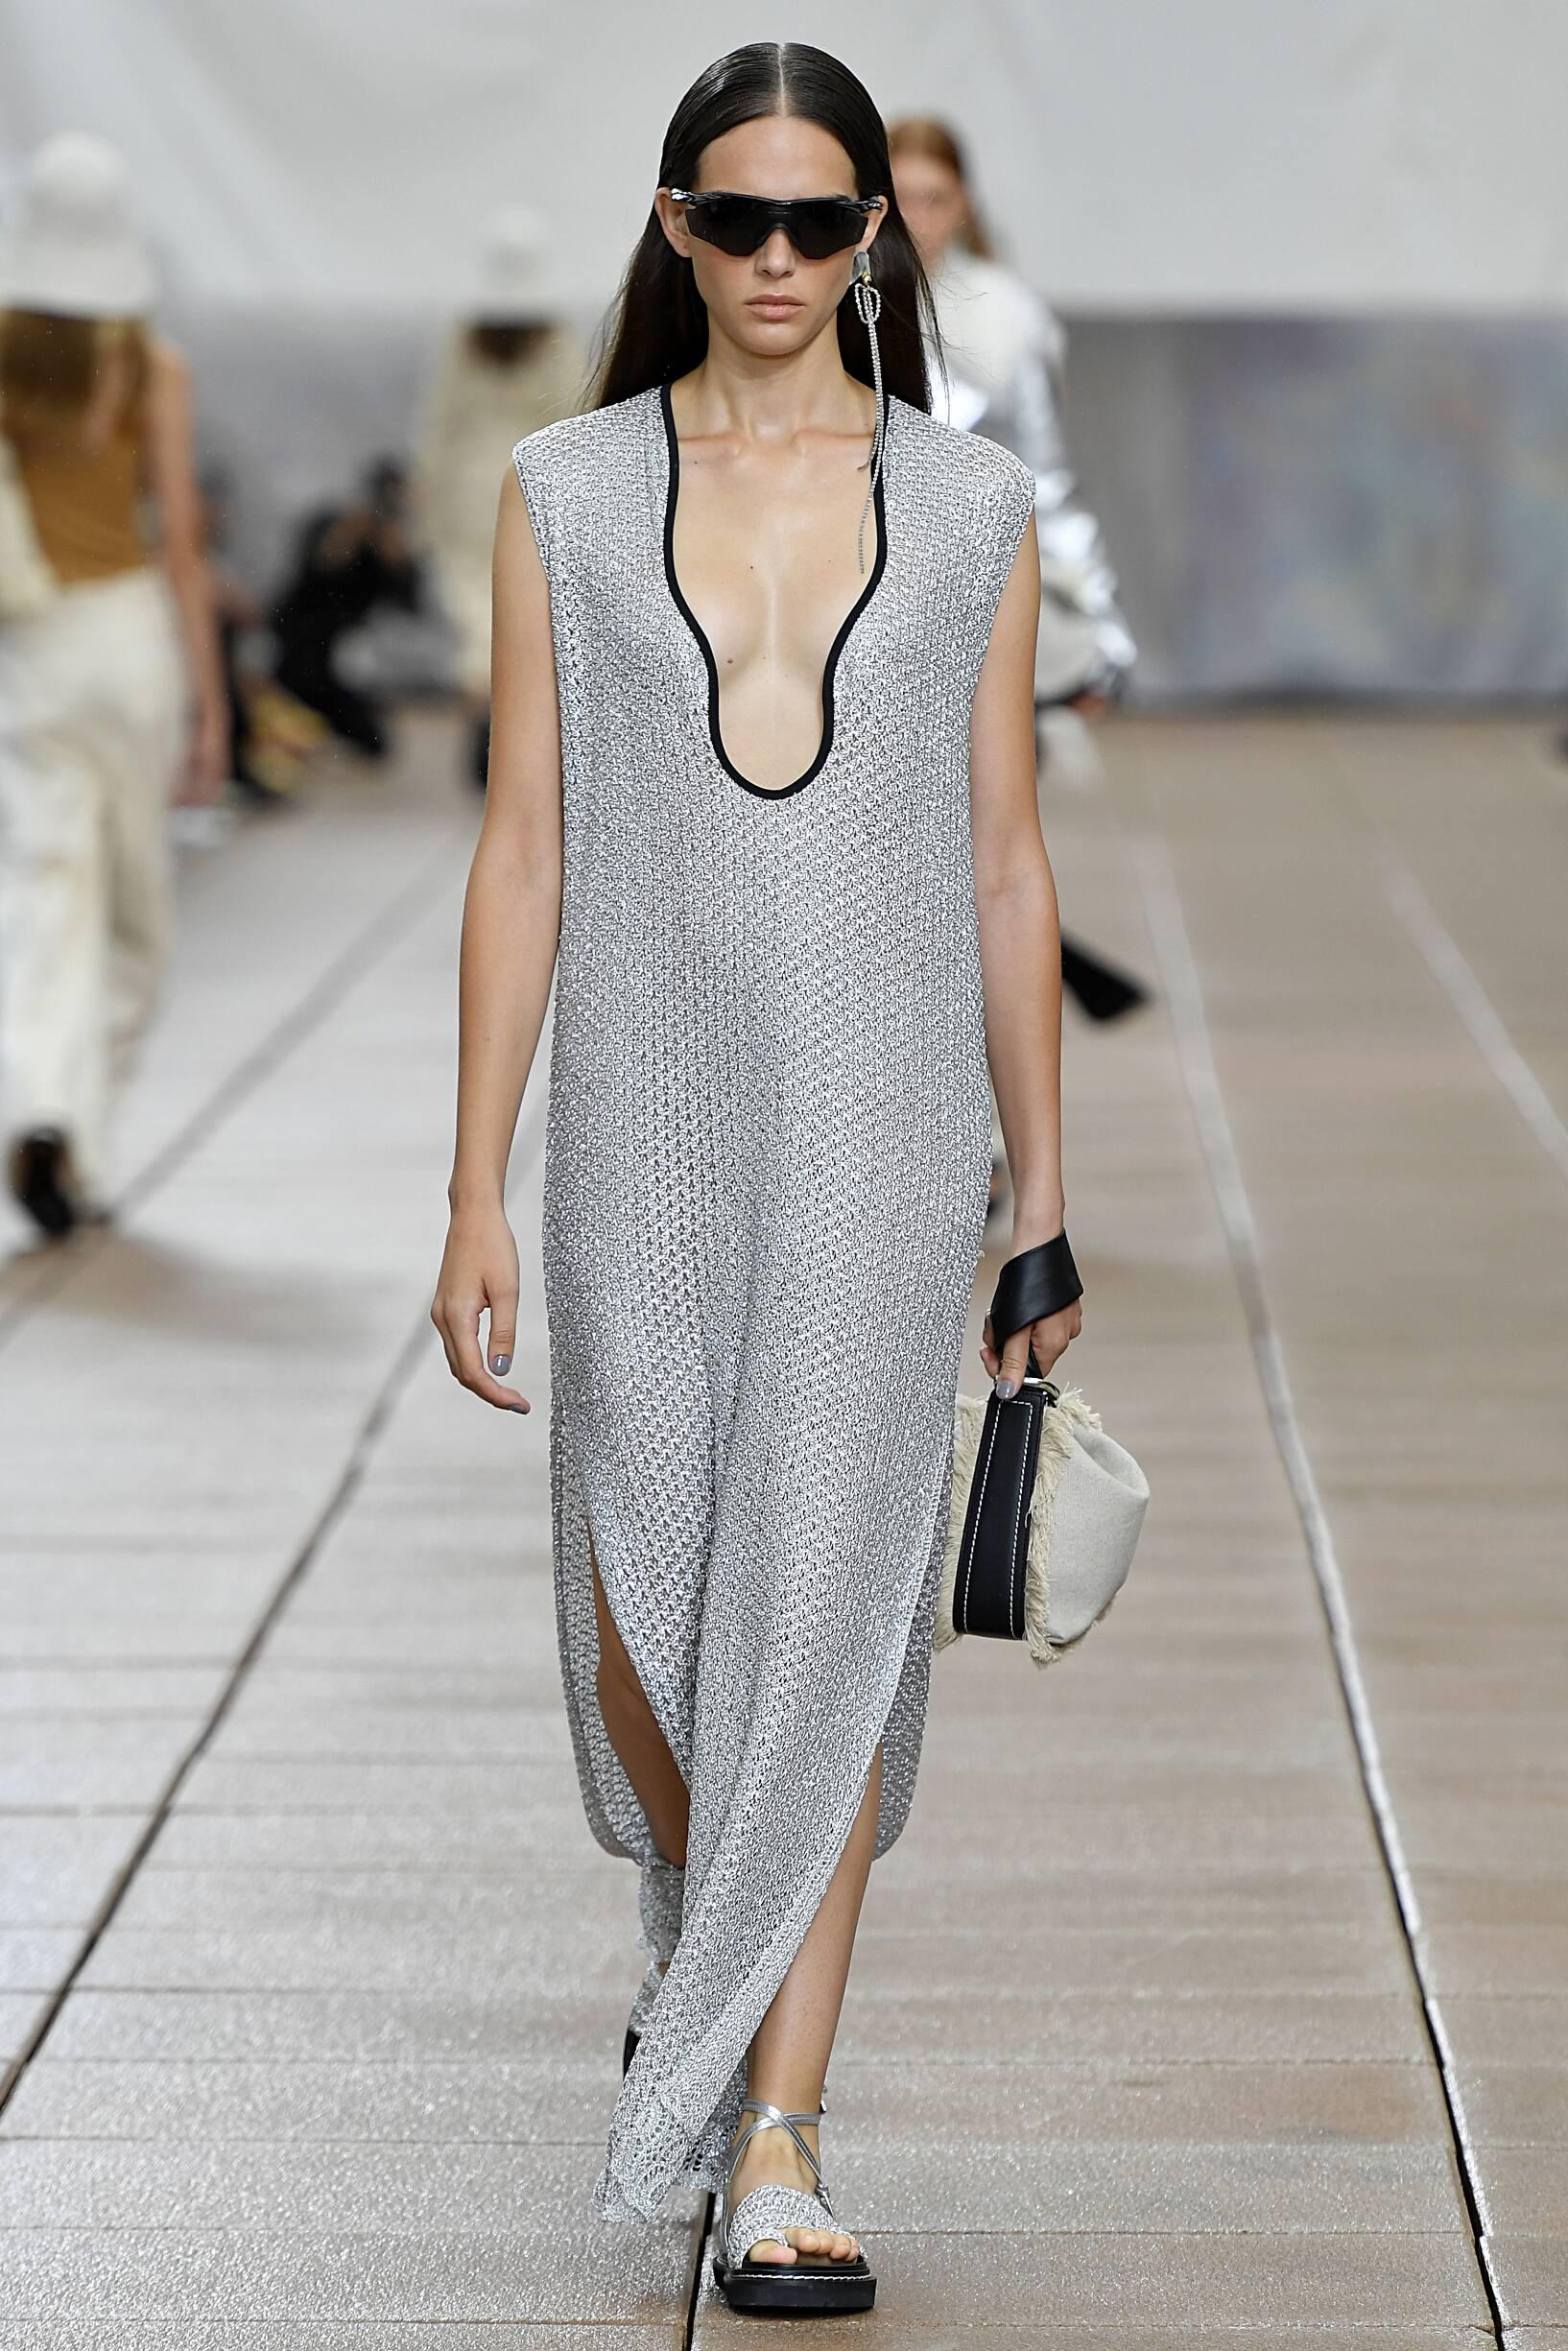 efab036e6f690 Runway 3.1 Phillip Lim Spring Summer 2019 Women's Collection New York  Fashion Week